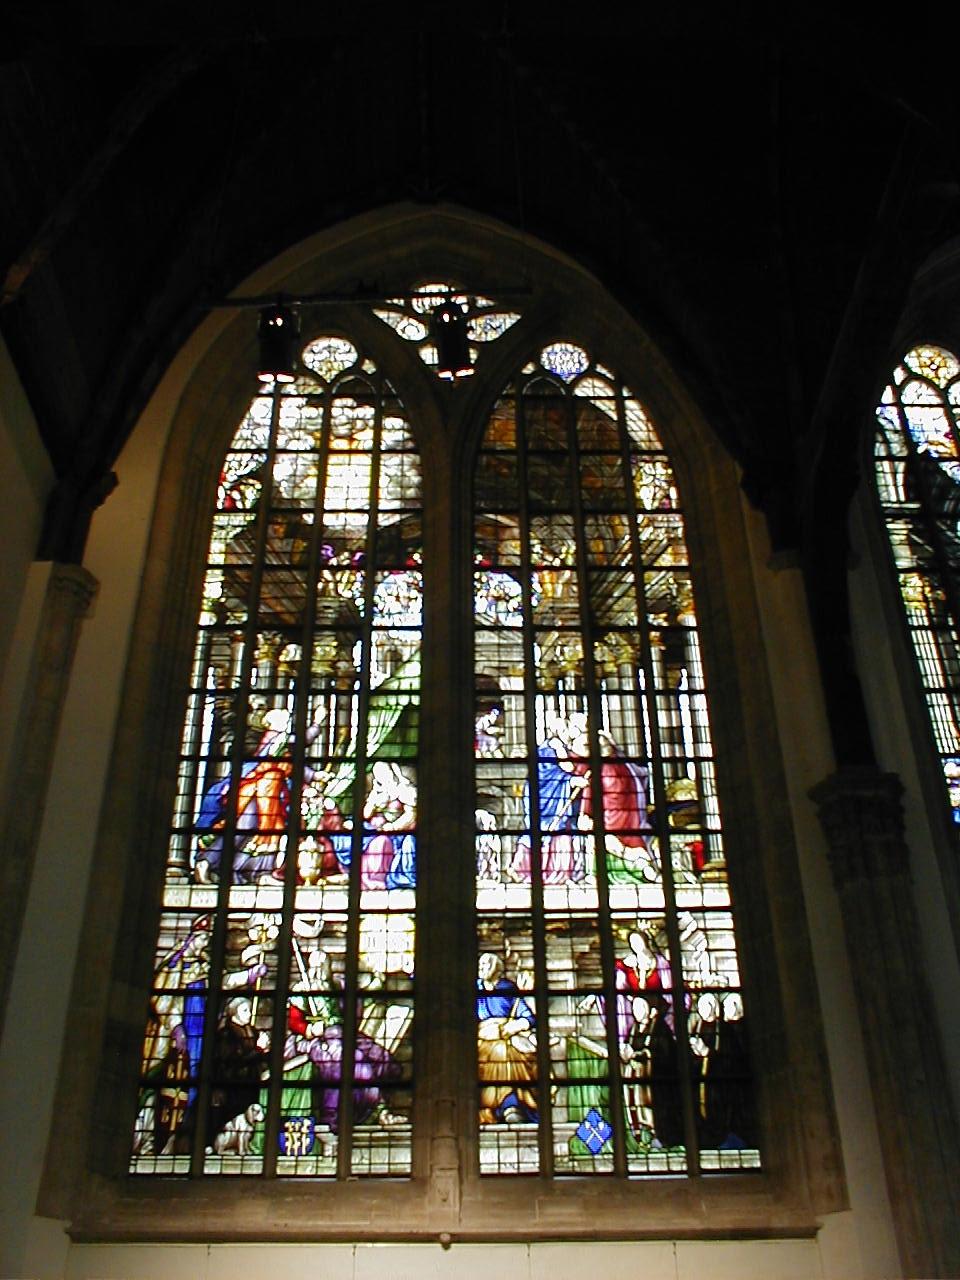 dario church window stained glass mosaic religion faith